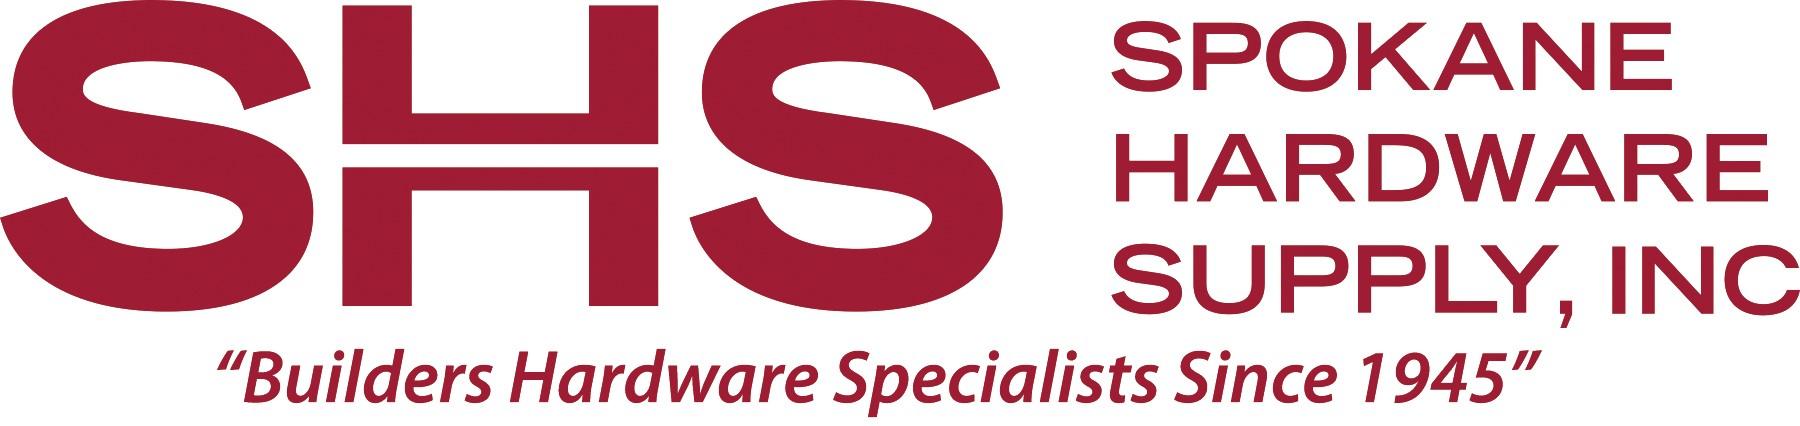 Spokane Hardware Supply